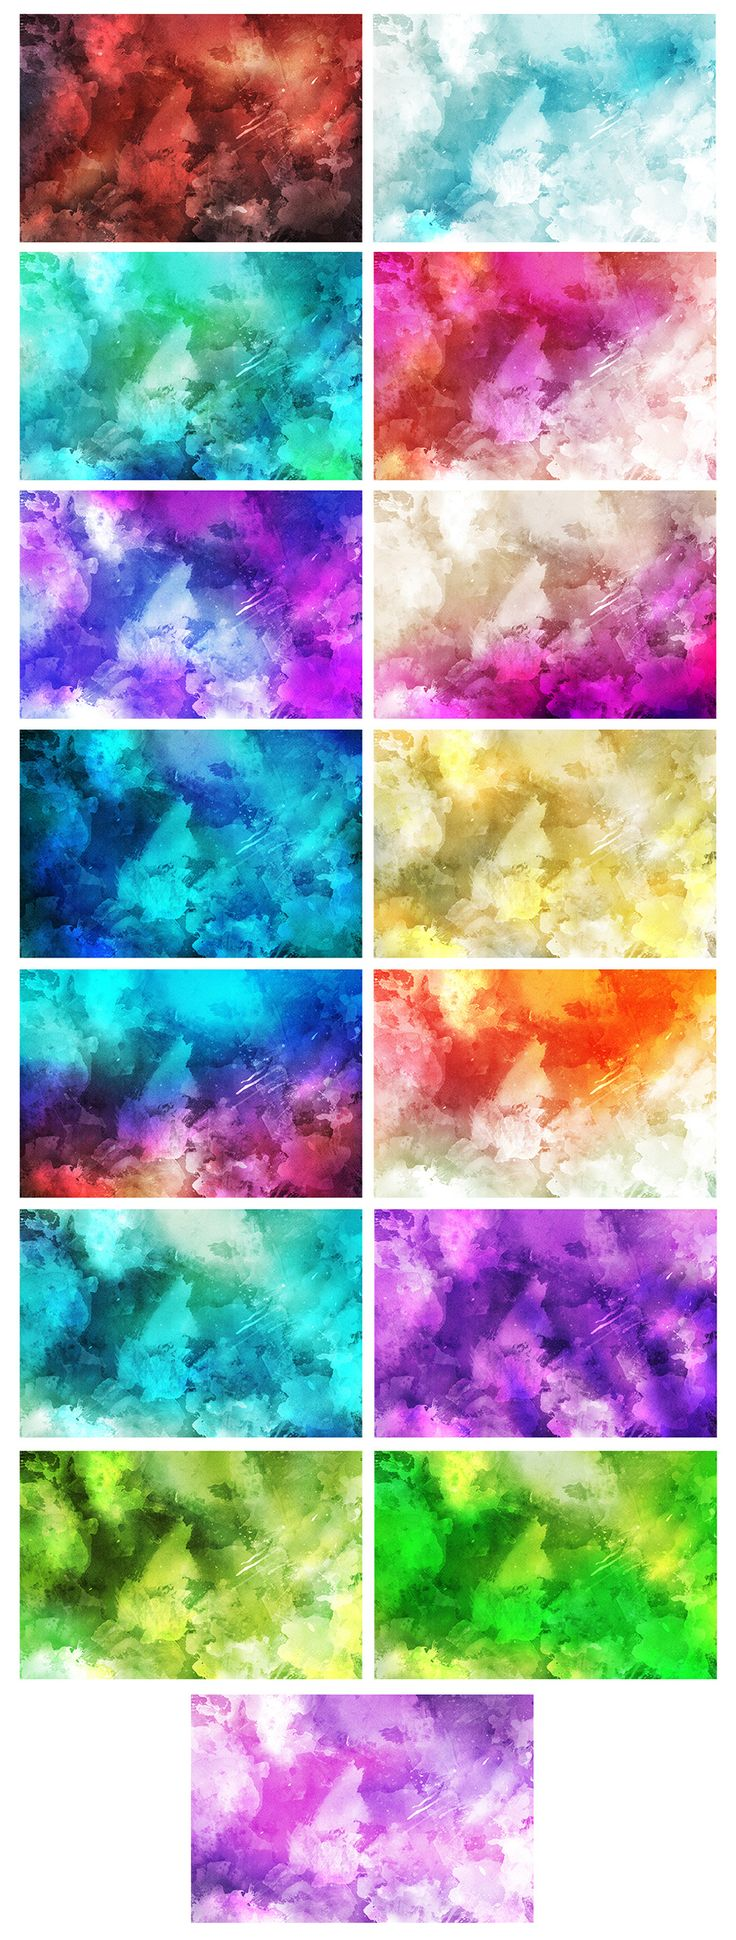 Watercolor Backgrounds 2 & Bonus - https://www.designcuts.com/product/watercolor-backgrounds-2-bonus/